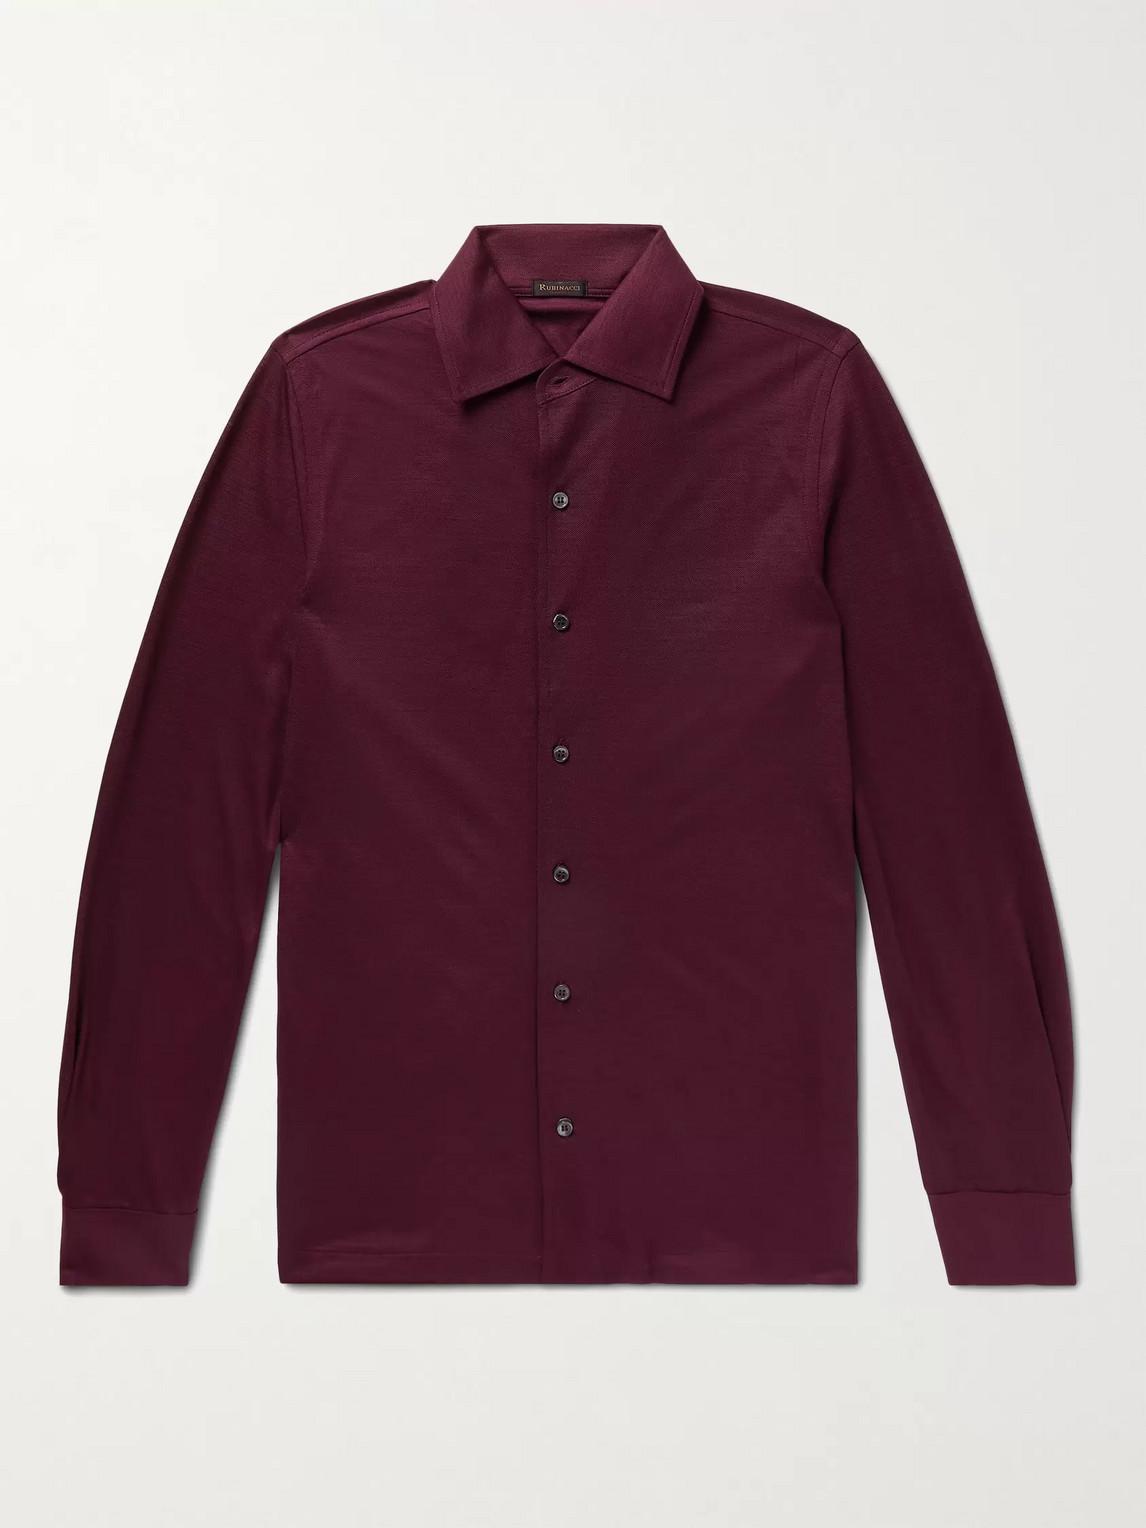 Rubinacci Slim-fit Wool Shirt In Burgundy